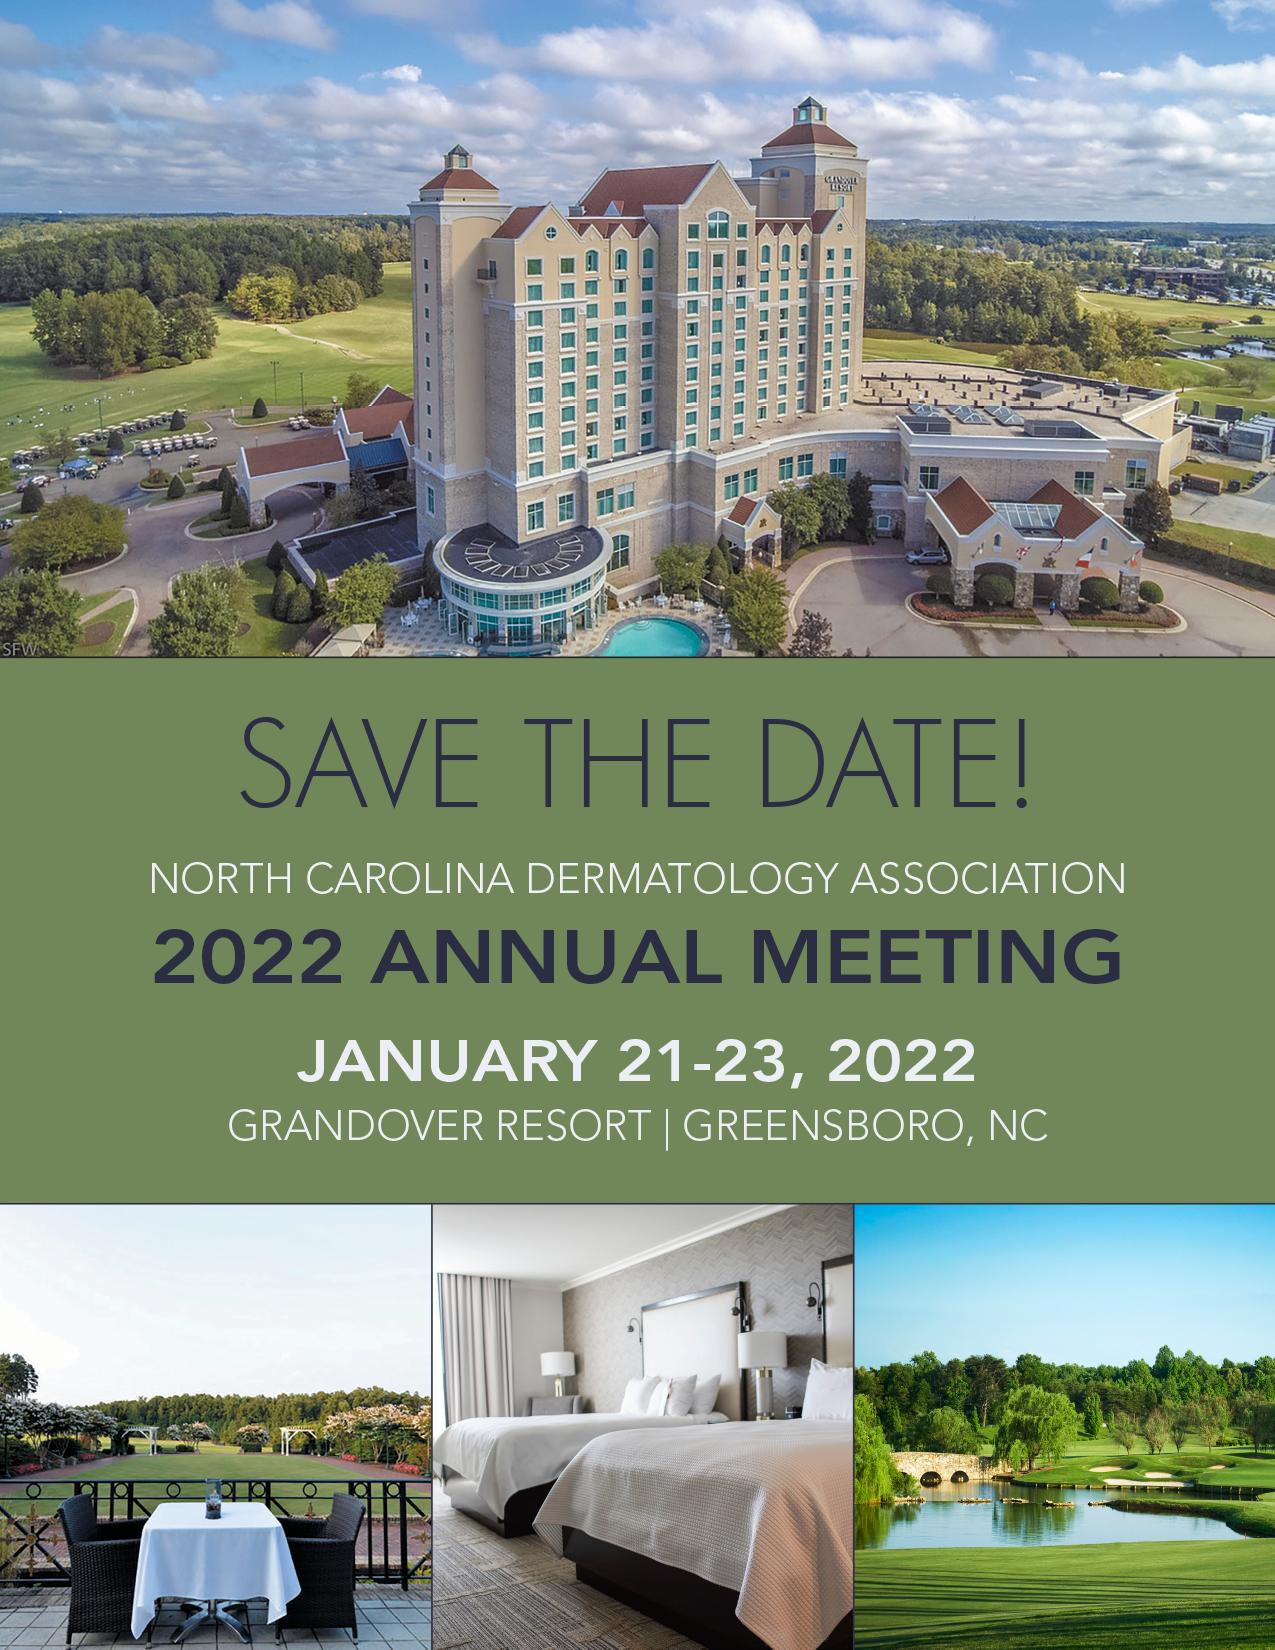 2022 NCDA Save the Date -- Jan. 21-23 at the Grandover Resort in Greensboro, NC